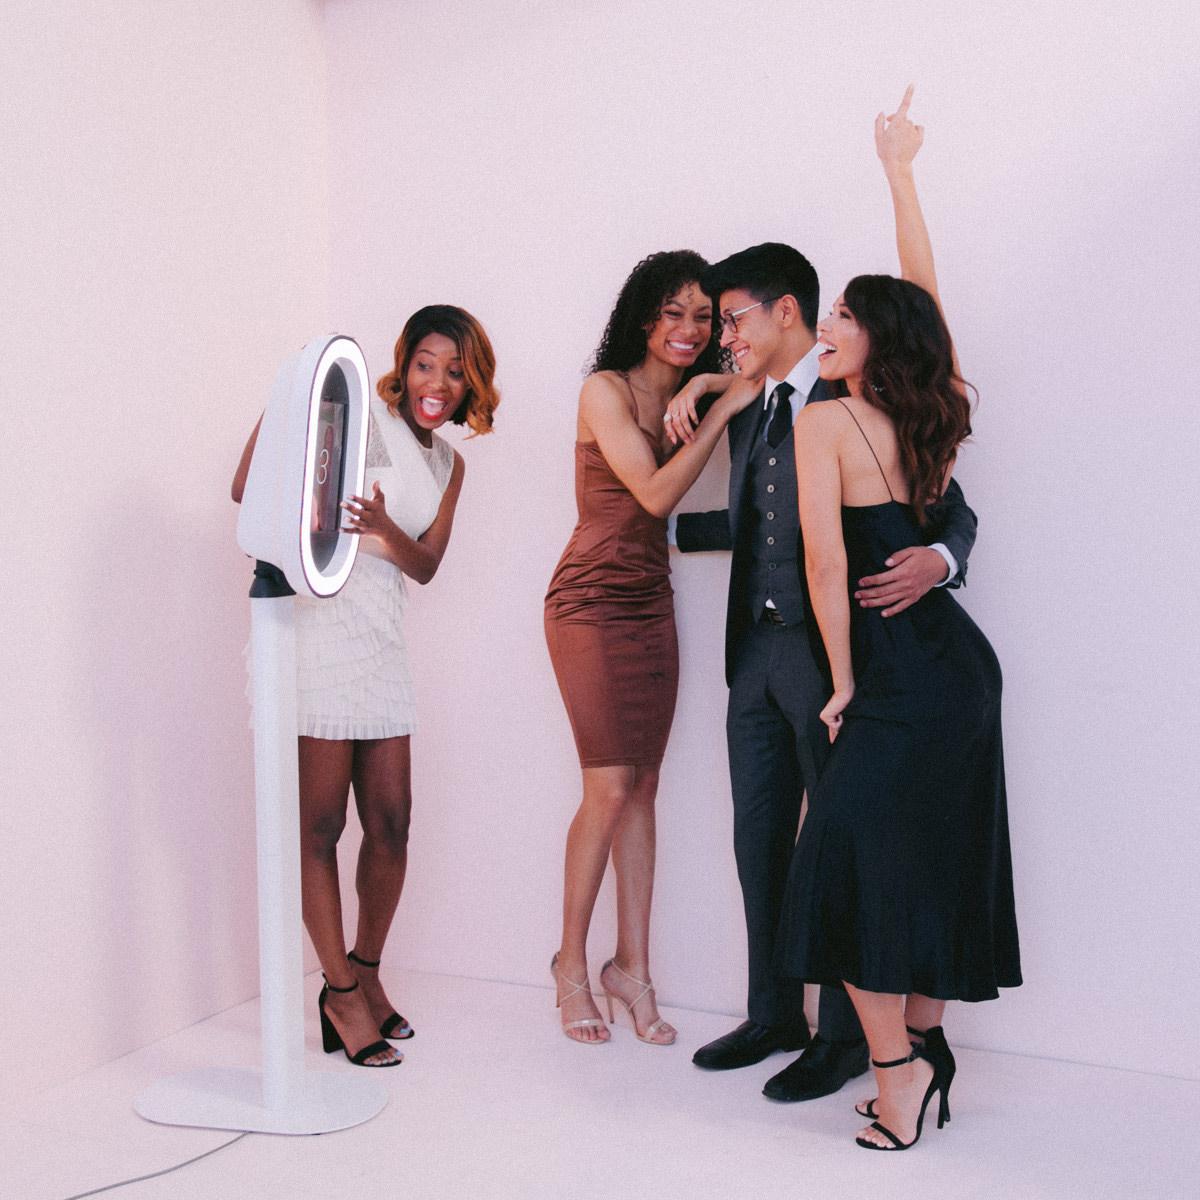 brand power ojai digital marketing photo booth